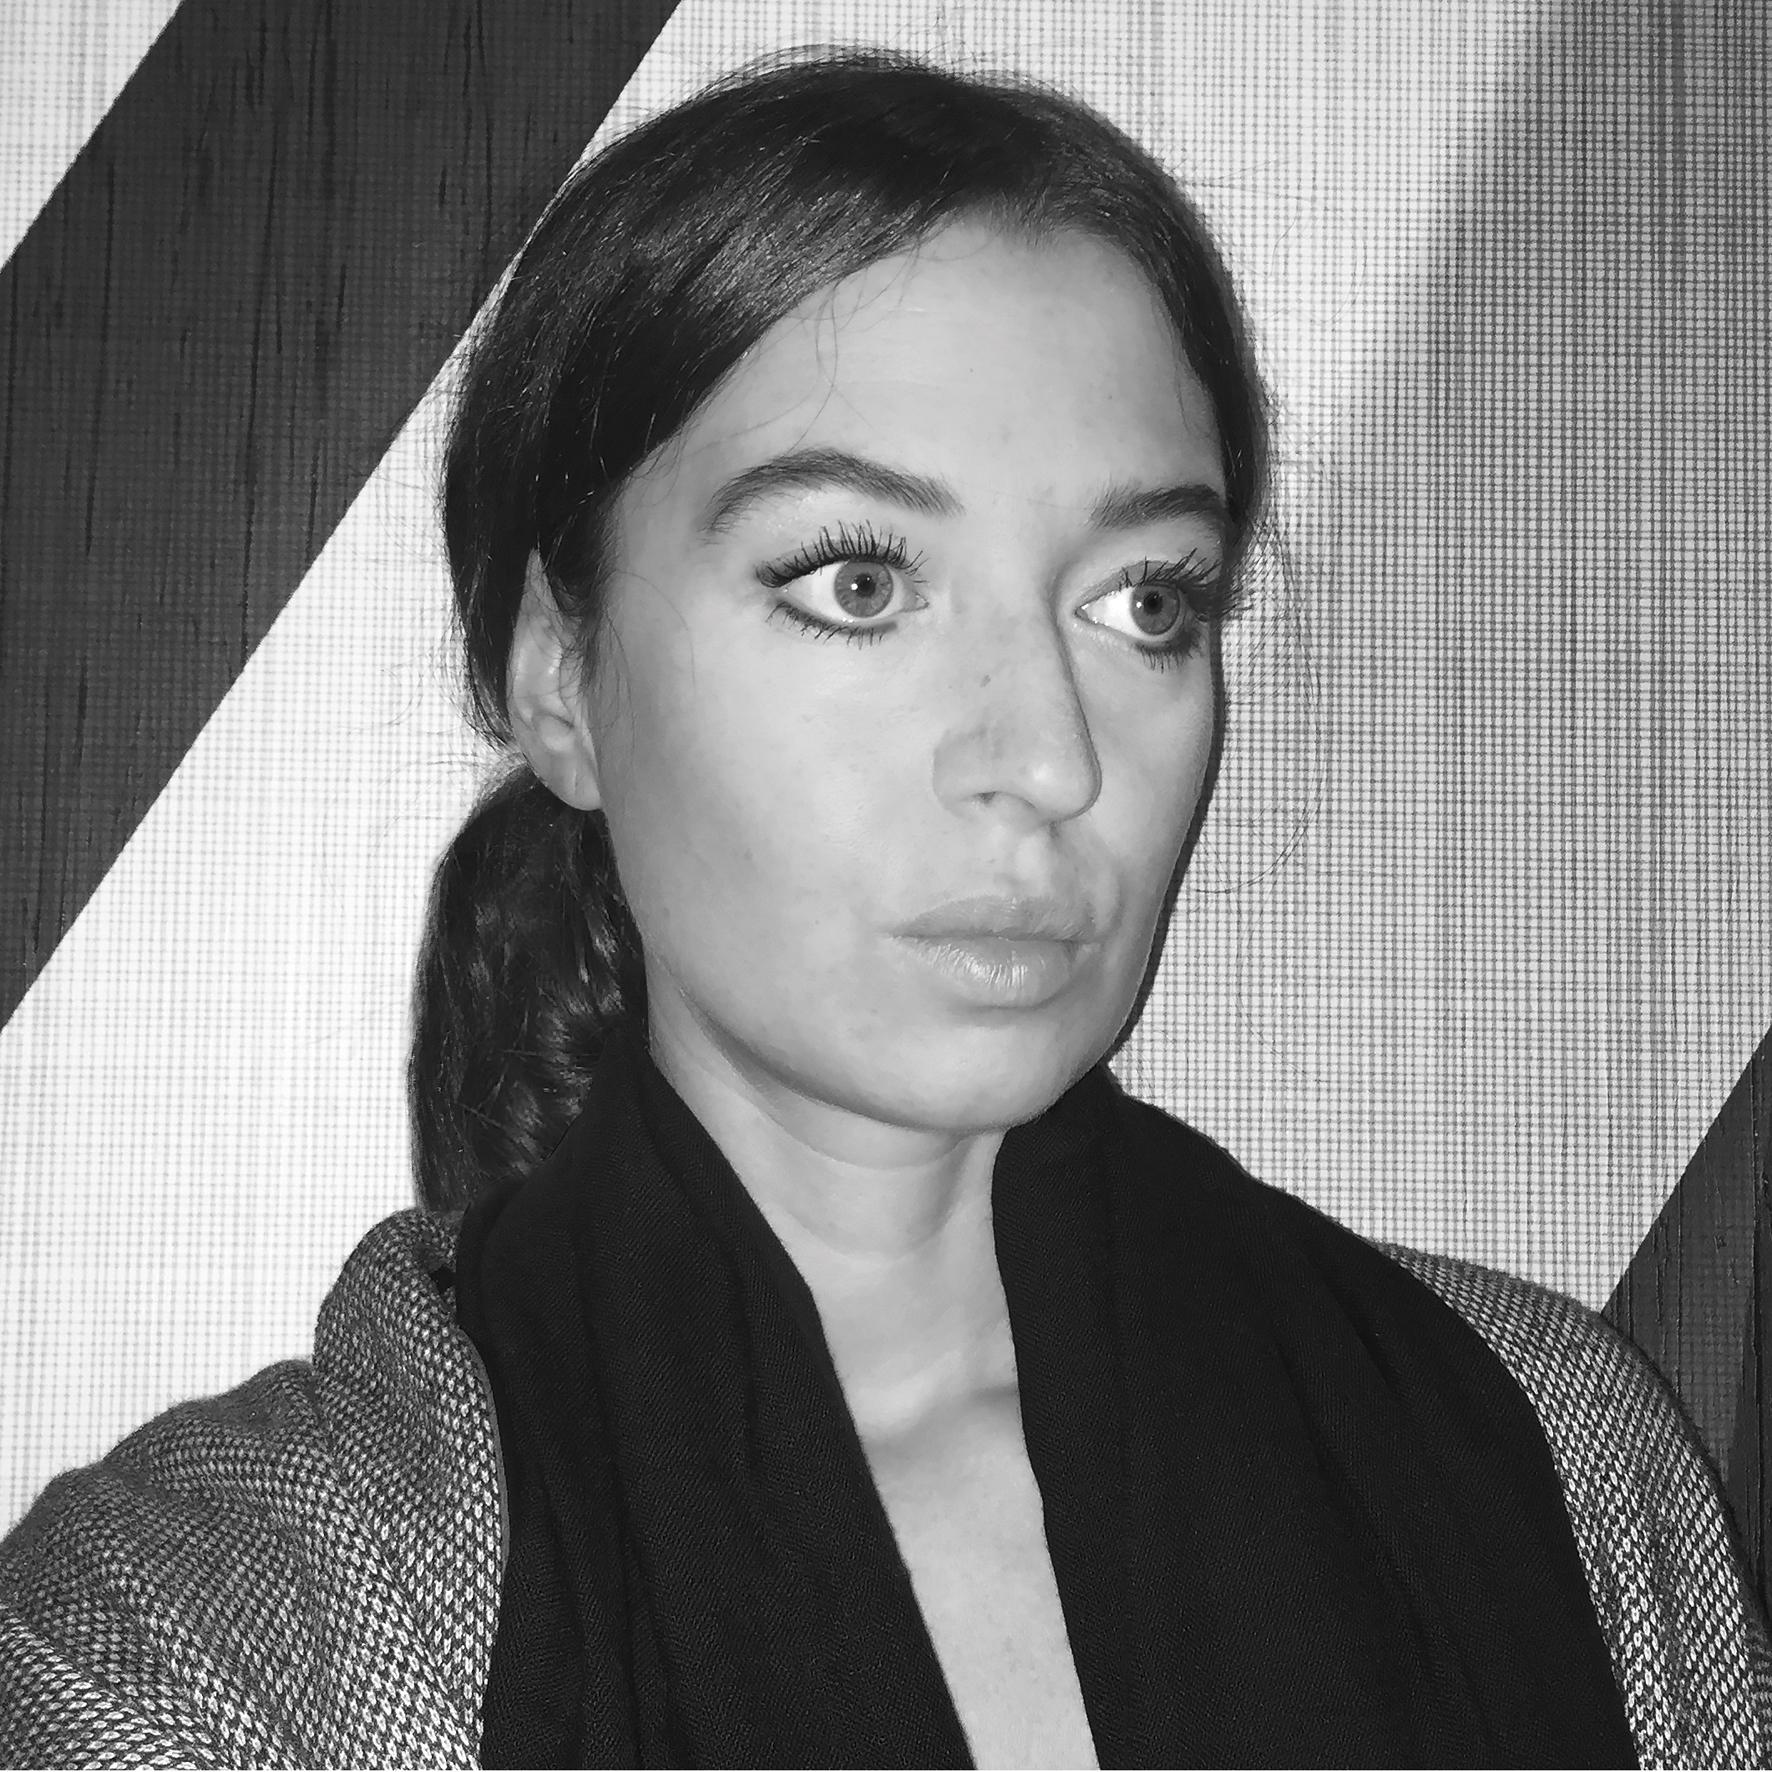 Valentina Ortolani